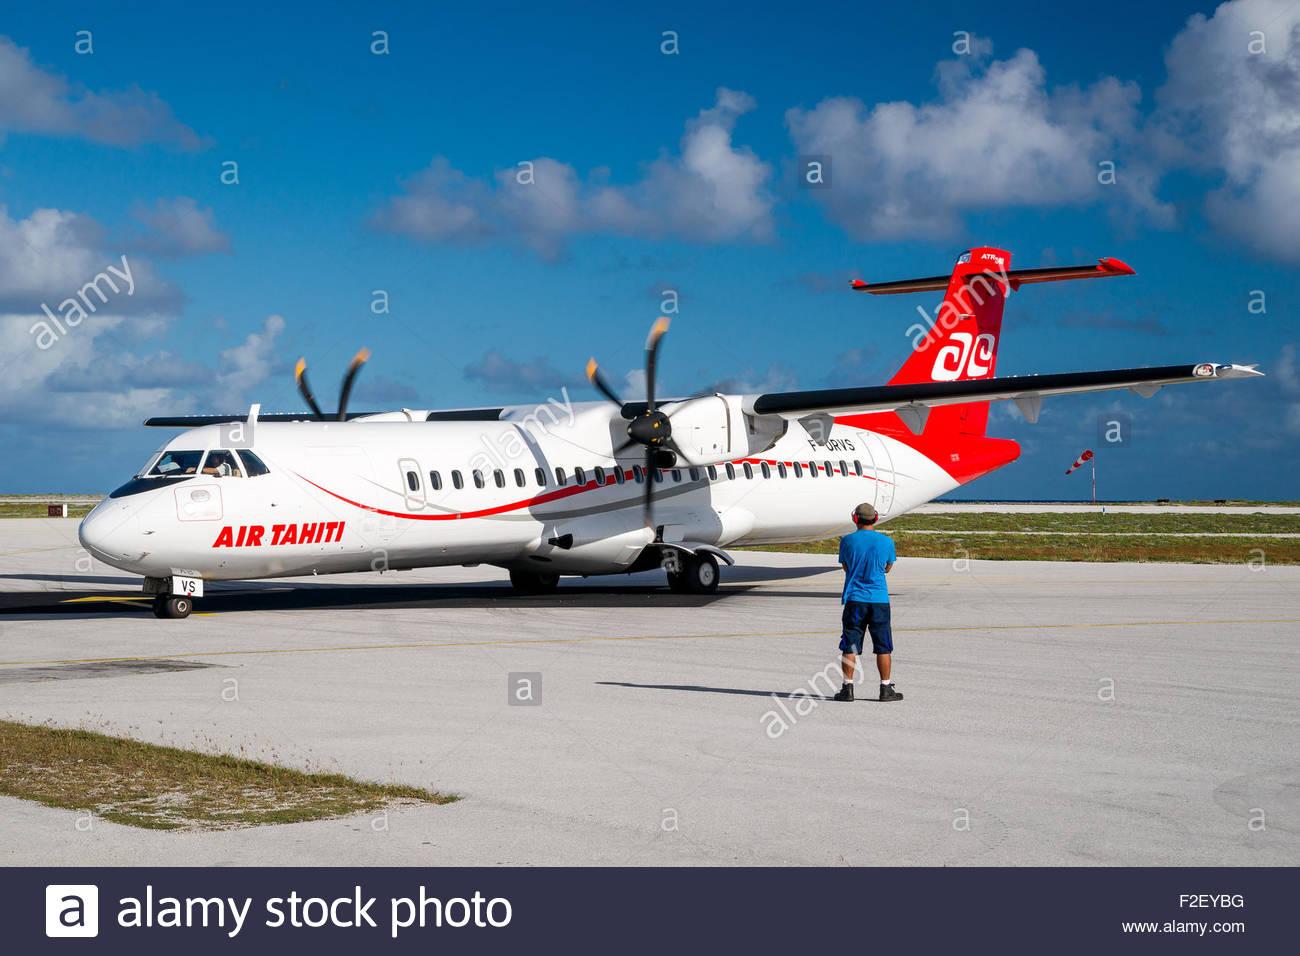 Air Tahiti ATR airplane in French Polynesia Stock Photo